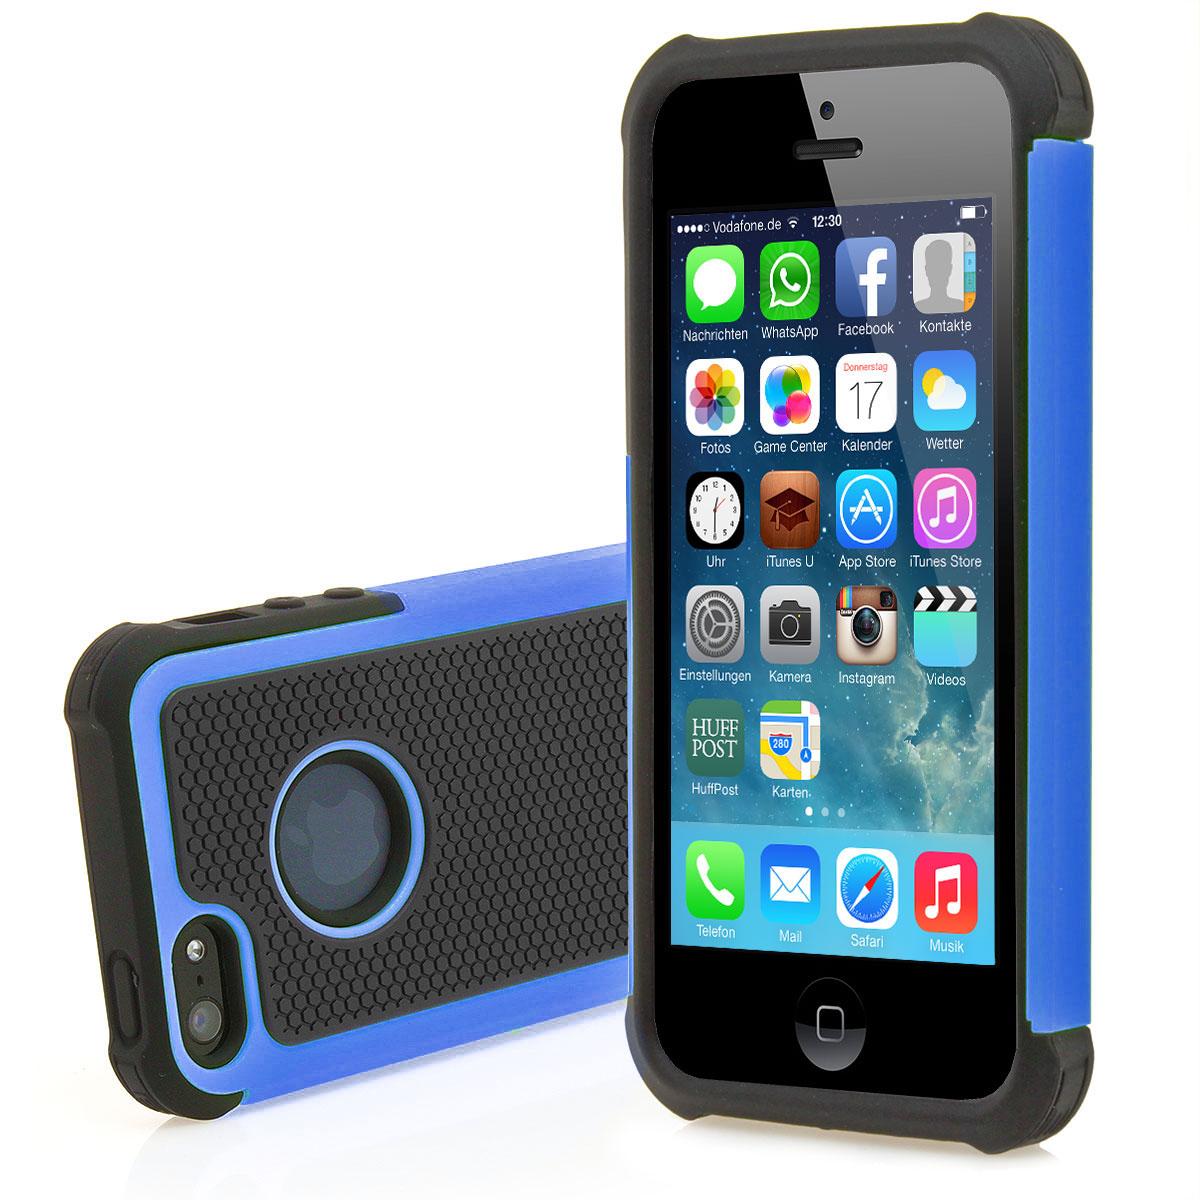 apple iphone 5 5s outdoor silikon schutz h lle bumper anti shock case tasche ebay. Black Bedroom Furniture Sets. Home Design Ideas